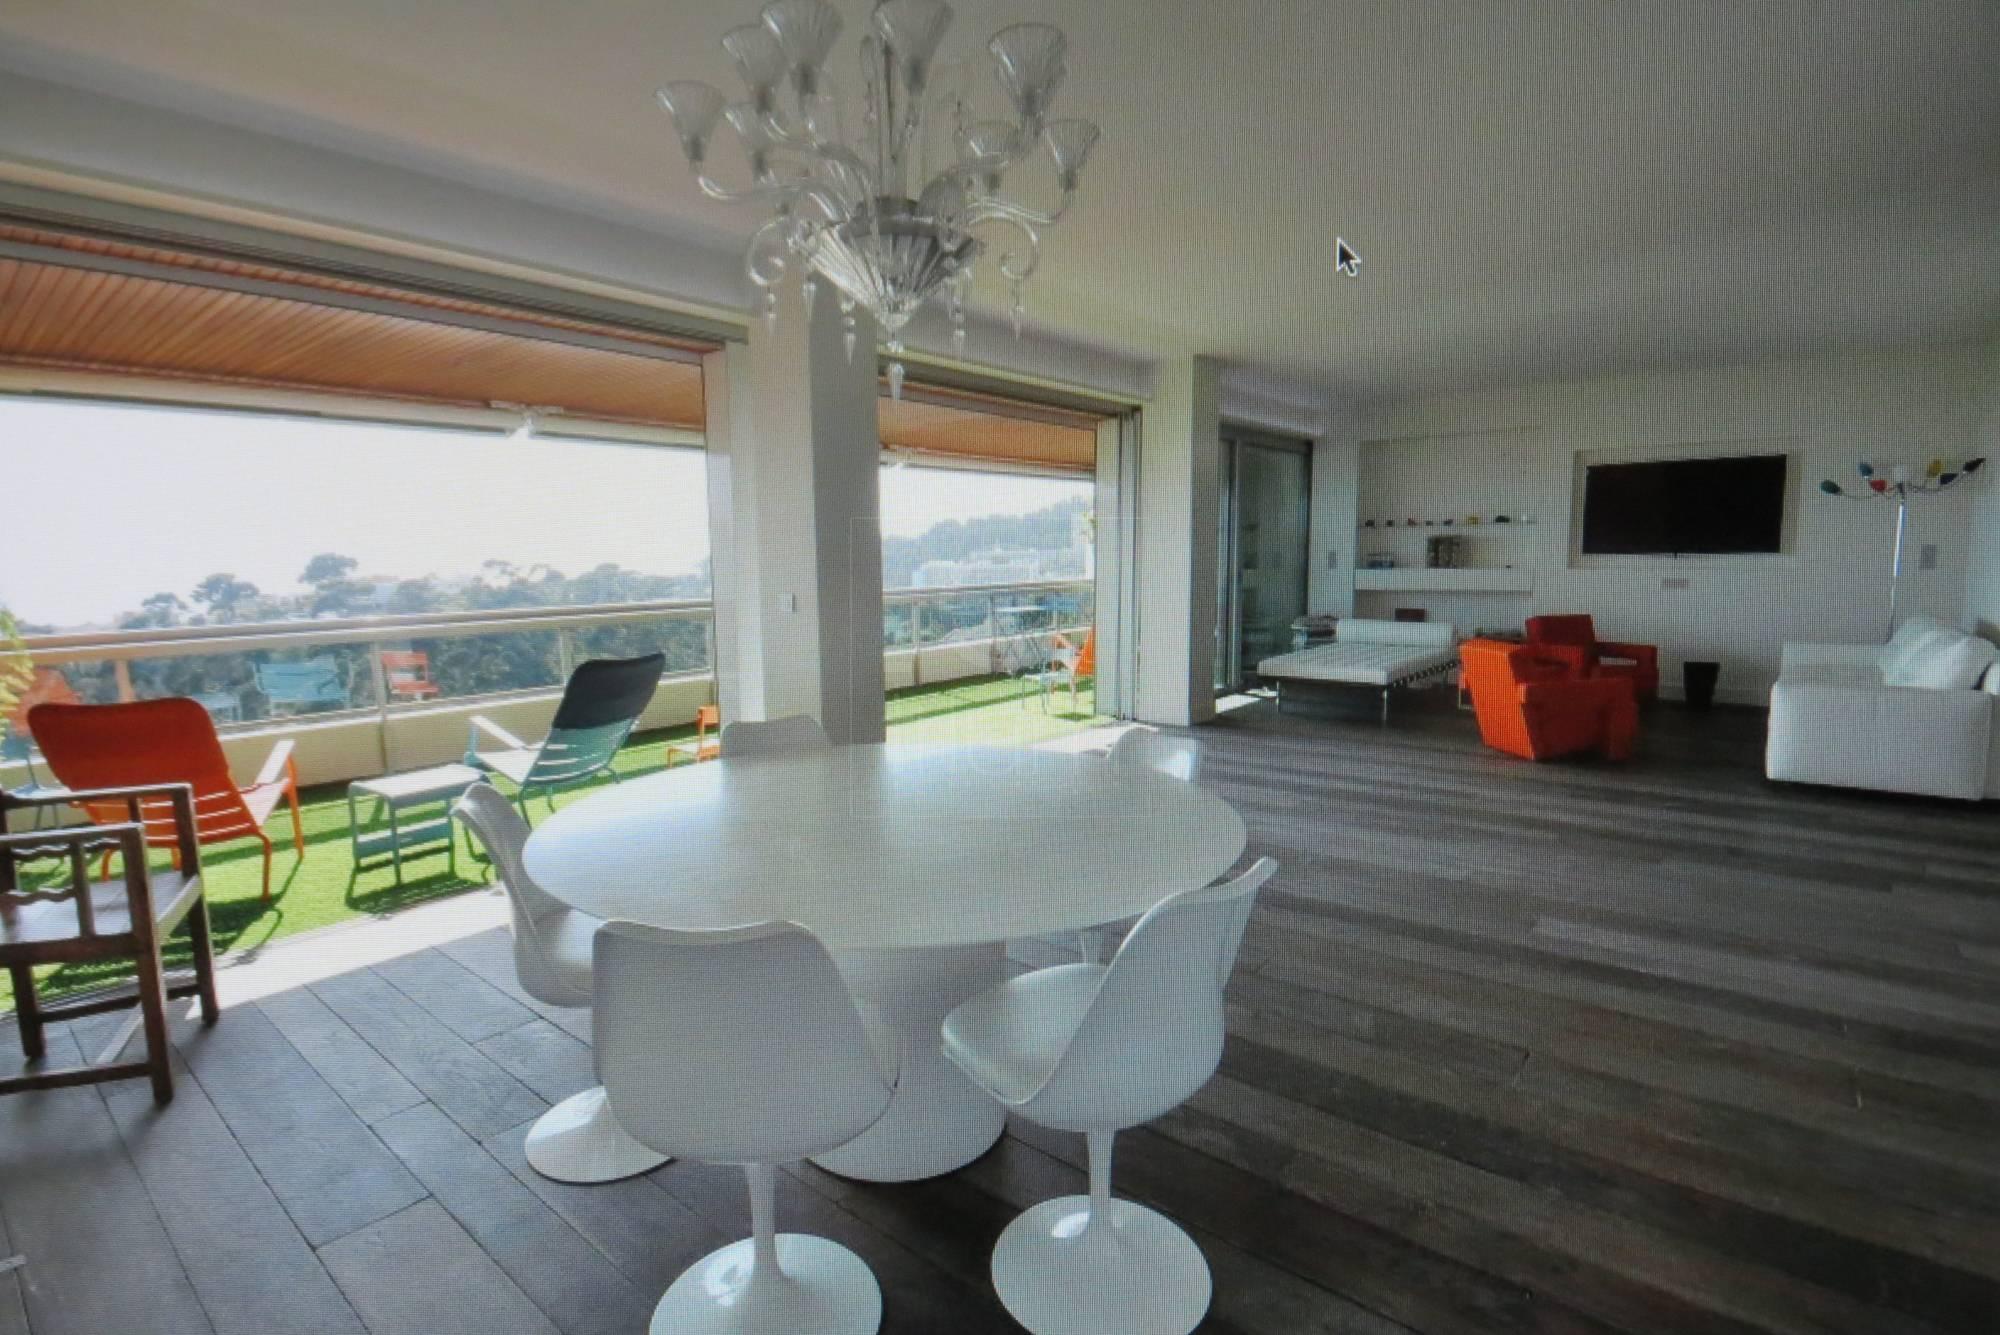 Vente appartement t3 f3 marseille 13008 bagatelle agence for Appartement toit terrasse marseille 13008